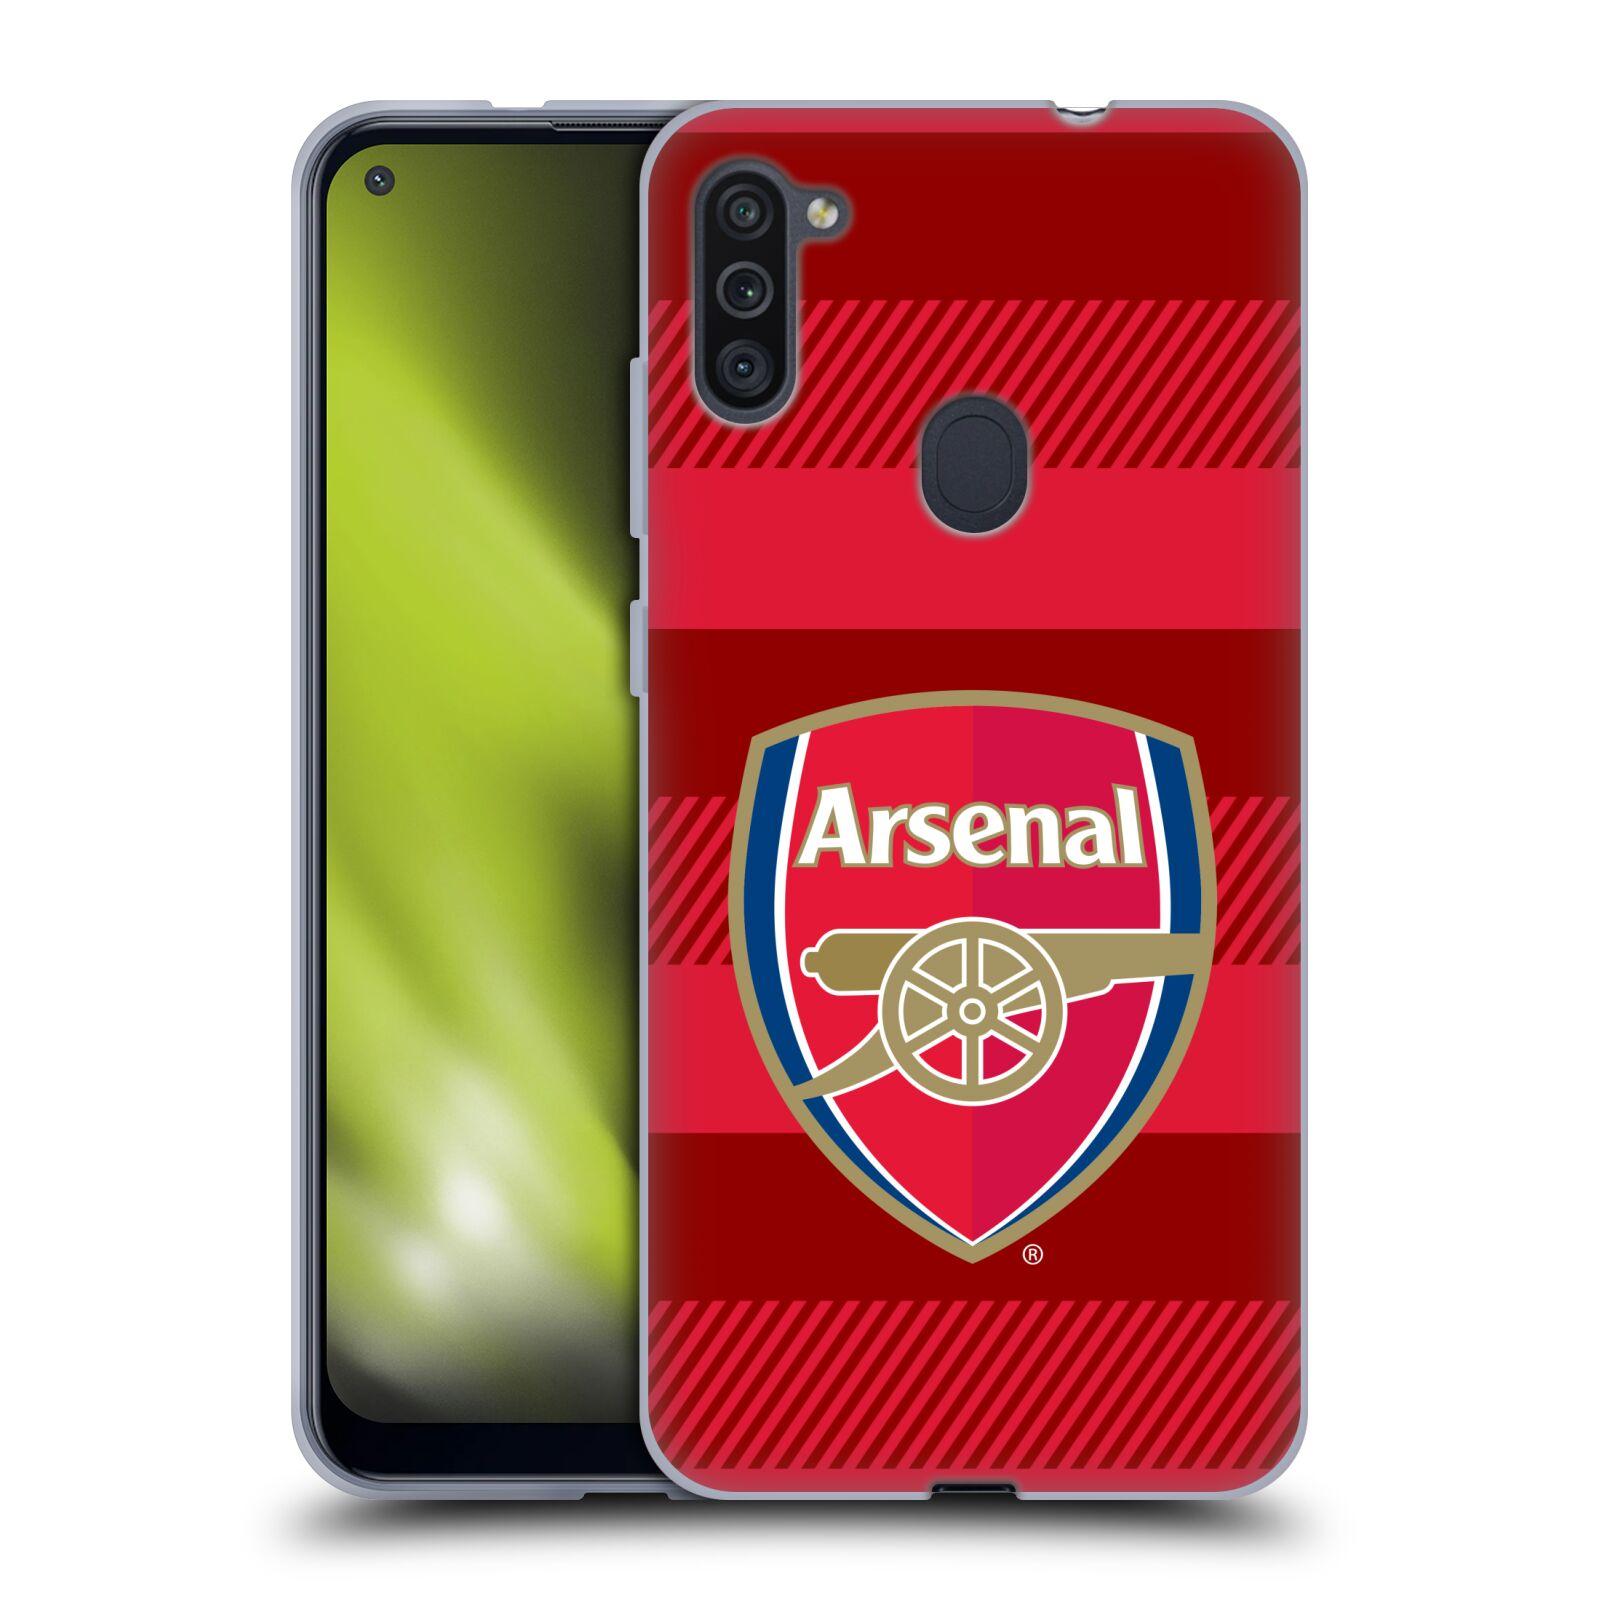 Silikonové pouzdro na mobil Samsung Galaxy M11 - Head Case - Arsenal FC - Logo s pruhy